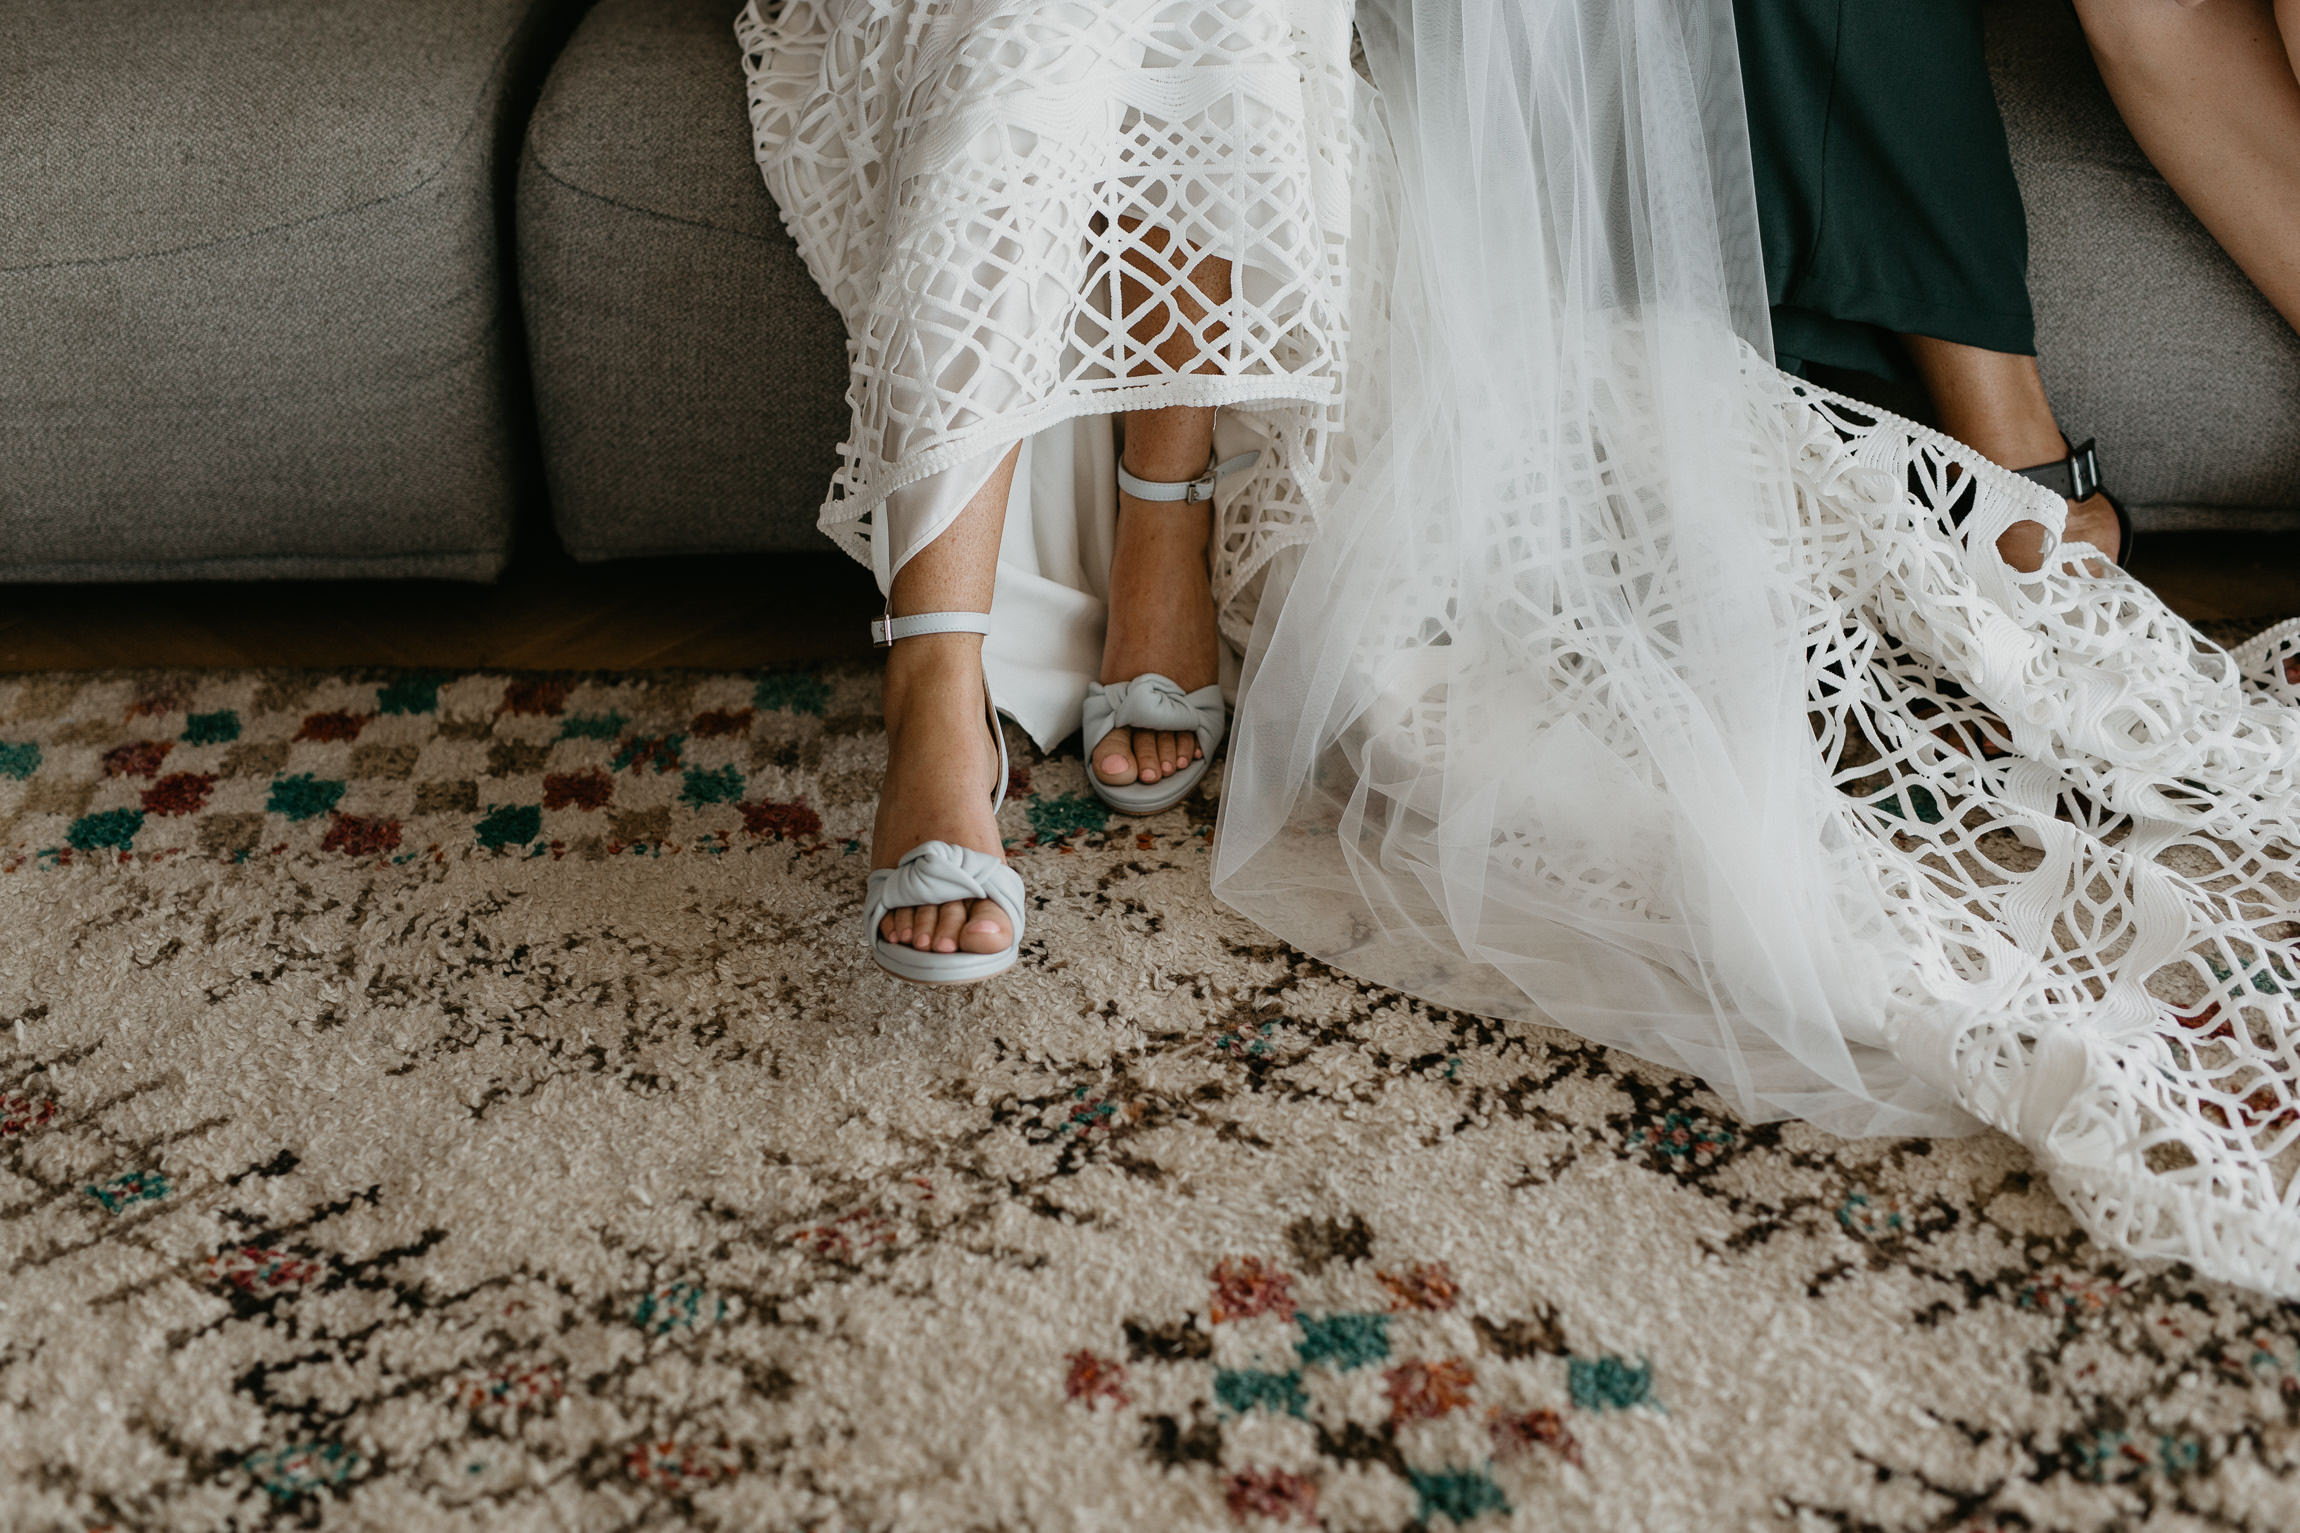 oldforestschool-wedding-blog-17.jpg